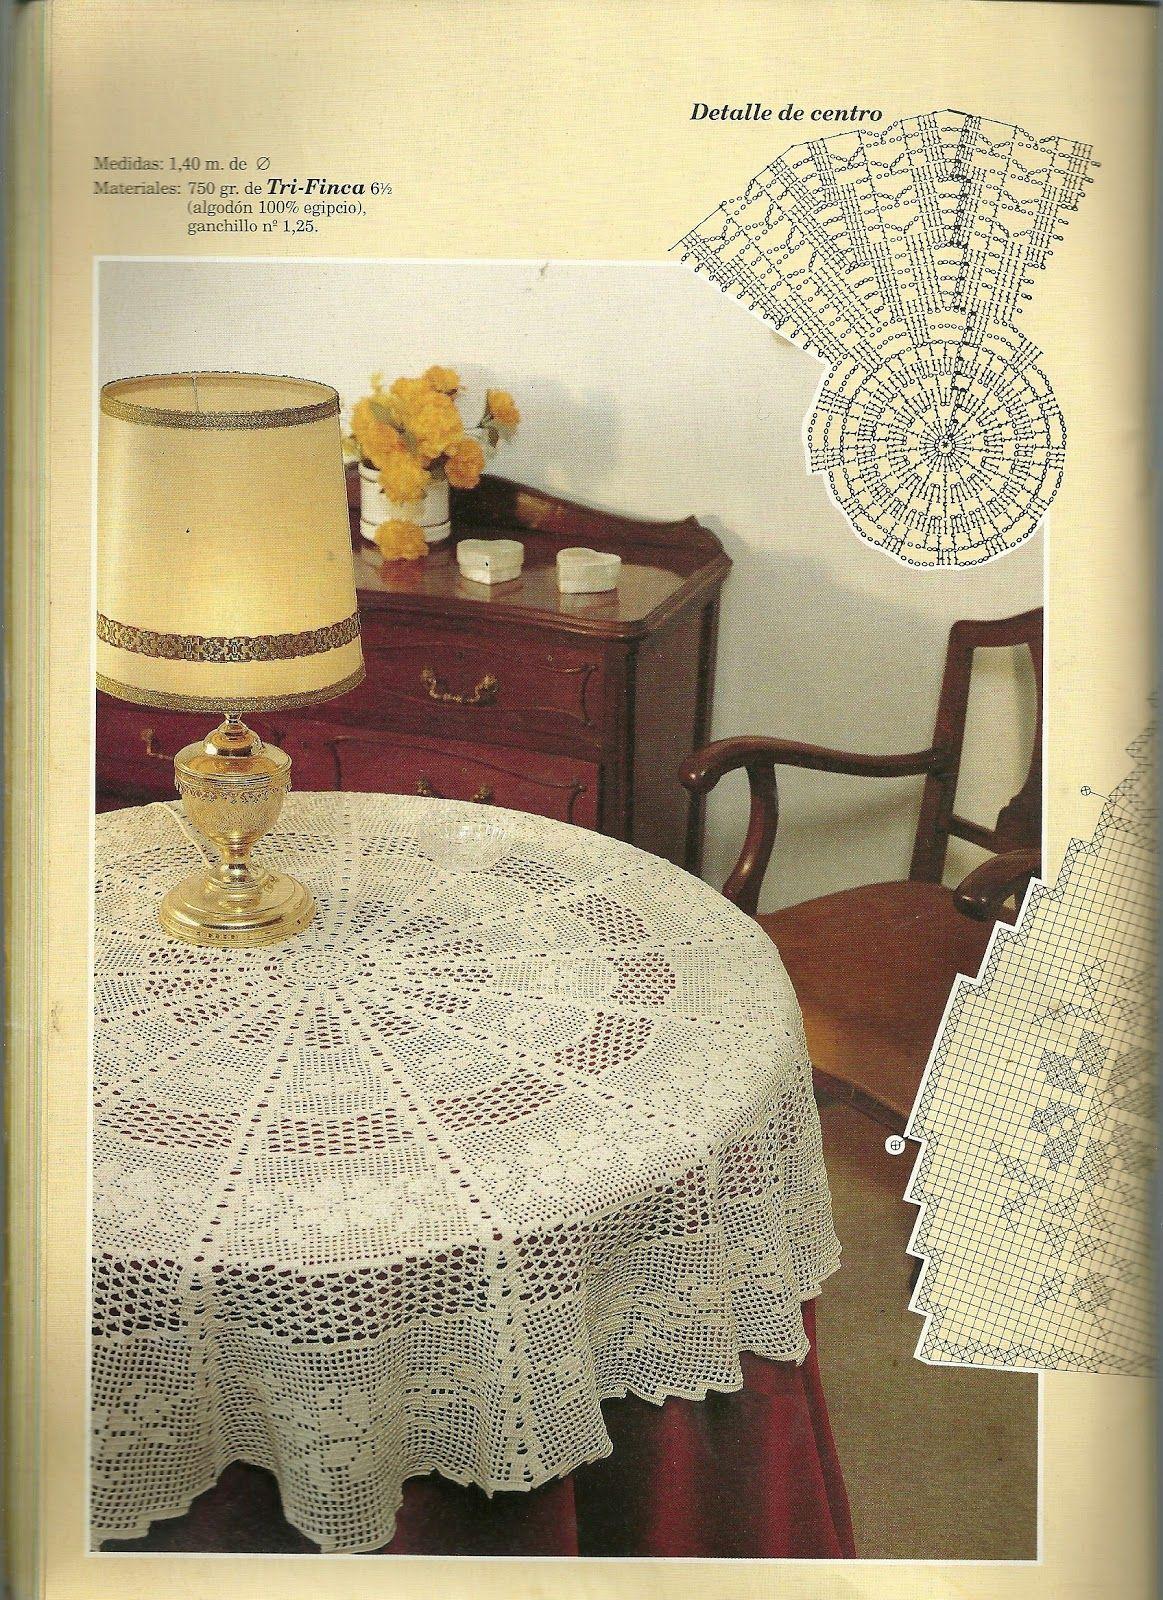 مفارش كروشية للسفرة مفرش كروشية دائري طريقة مفرش كروشية بترونات مفارش كروشية Table Cloth Crochet Tablecloth Pattern Crochet Tablecloth